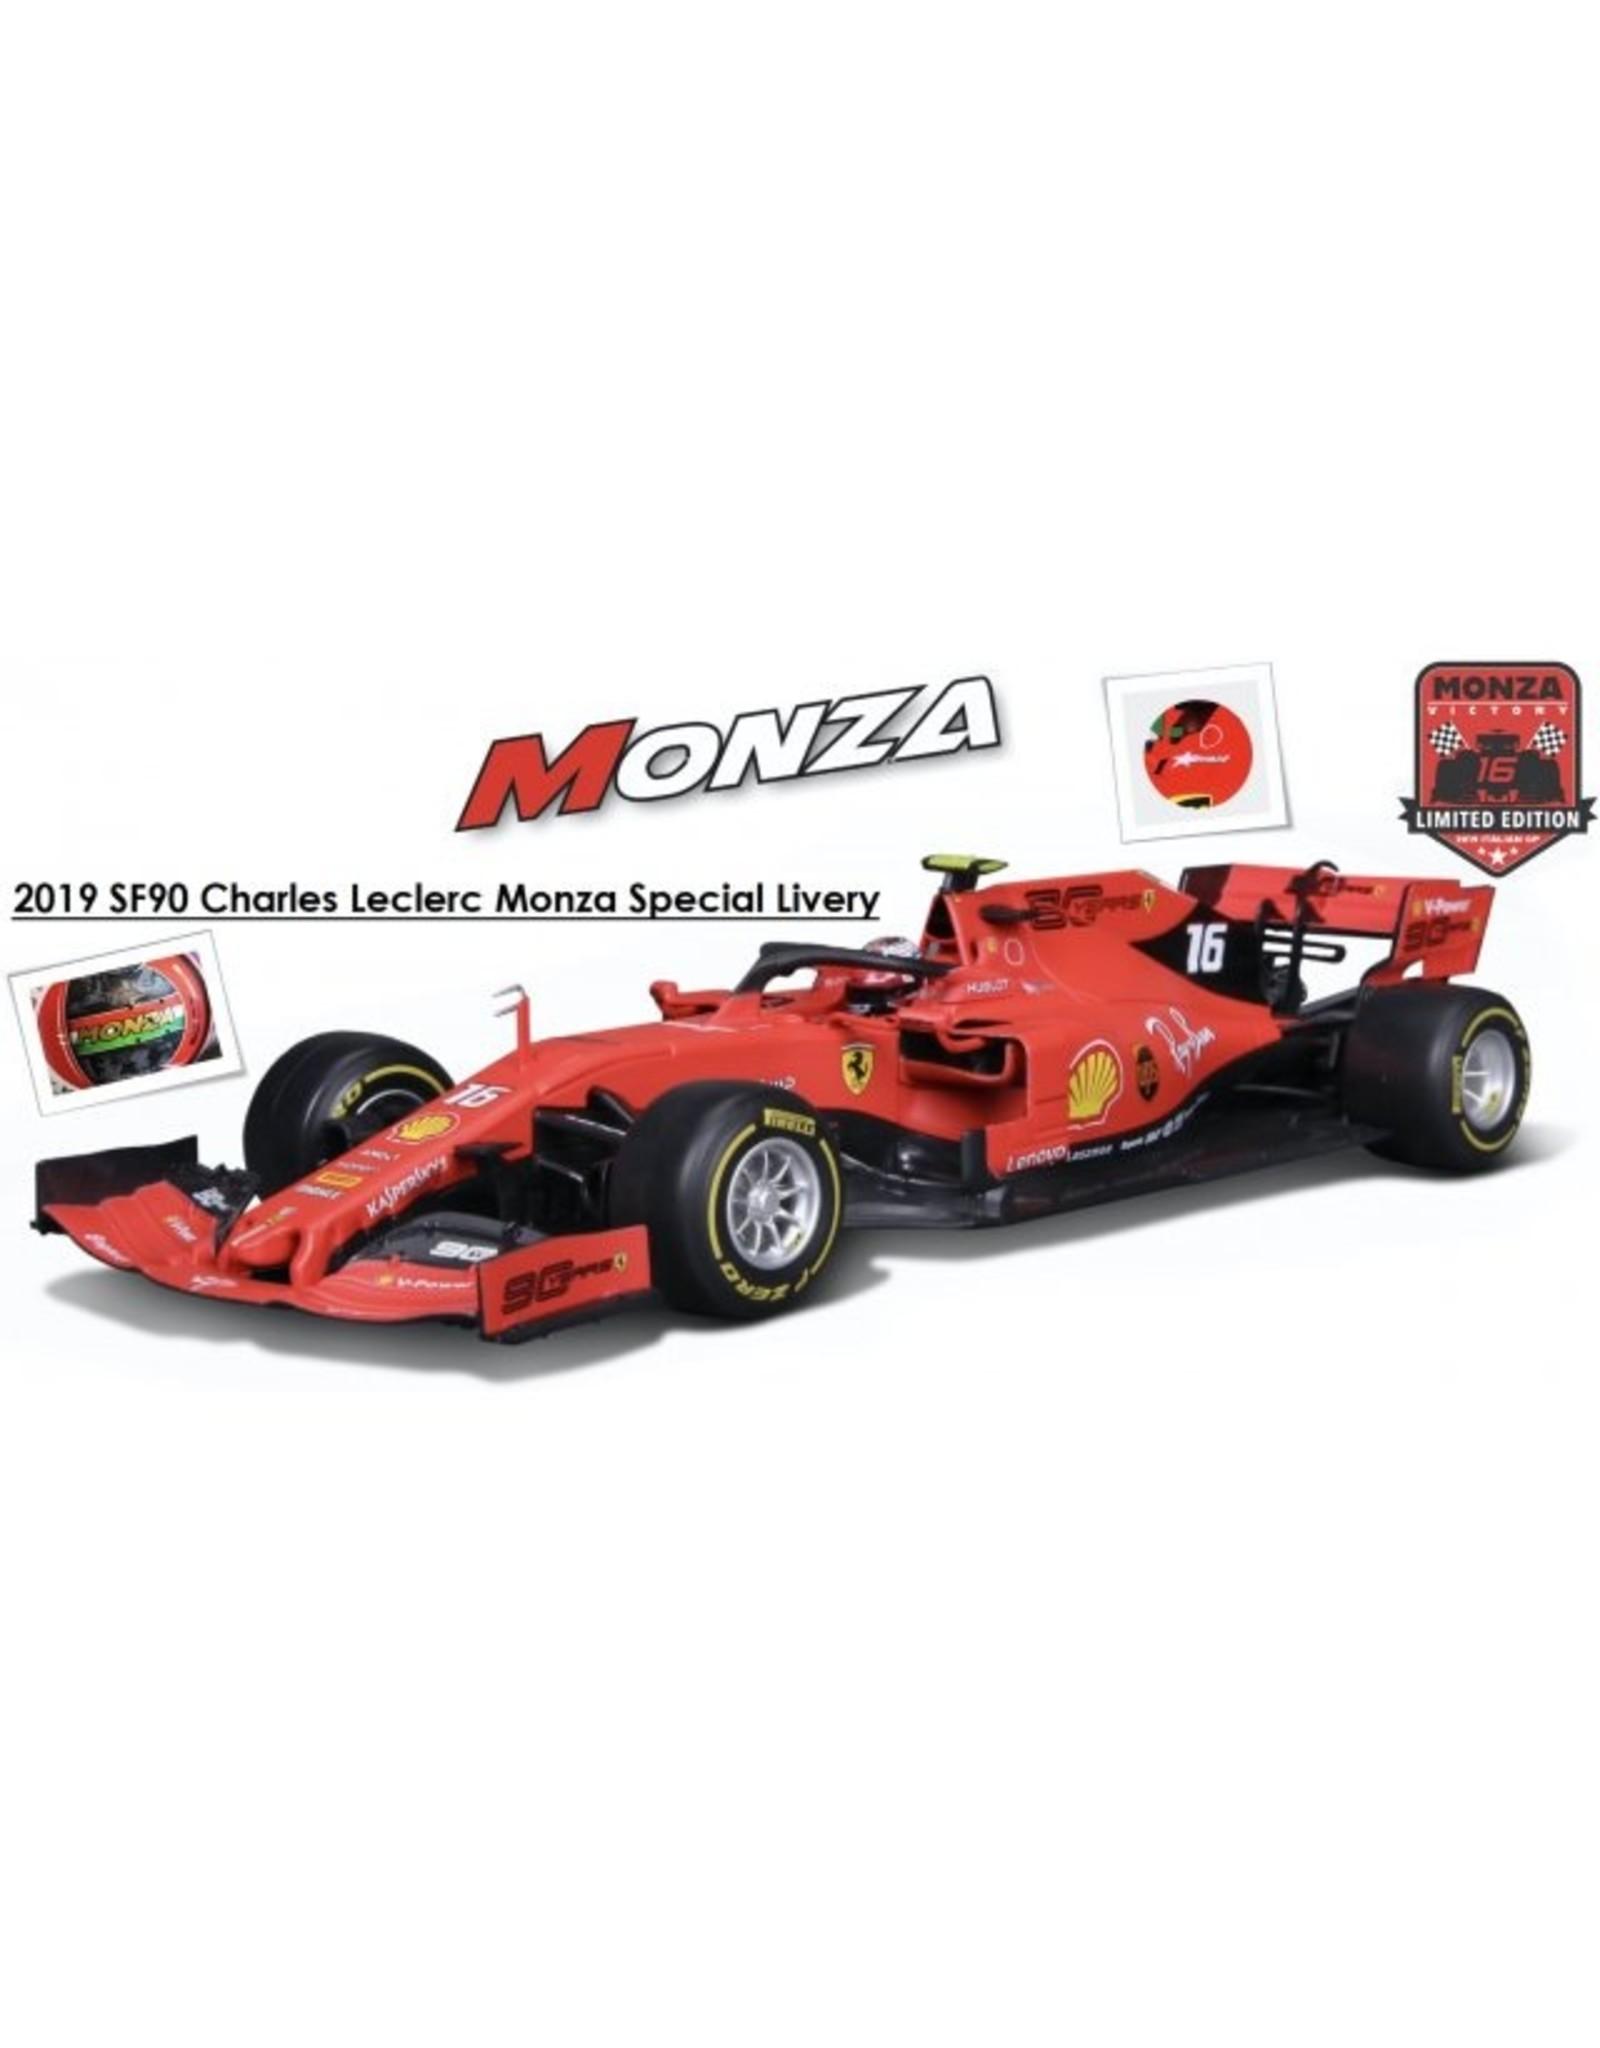 Formule 1 Formule 1 Ferrari SF90 #16 Leclerc Winner Monza 2019 - 1:18 - Bburago